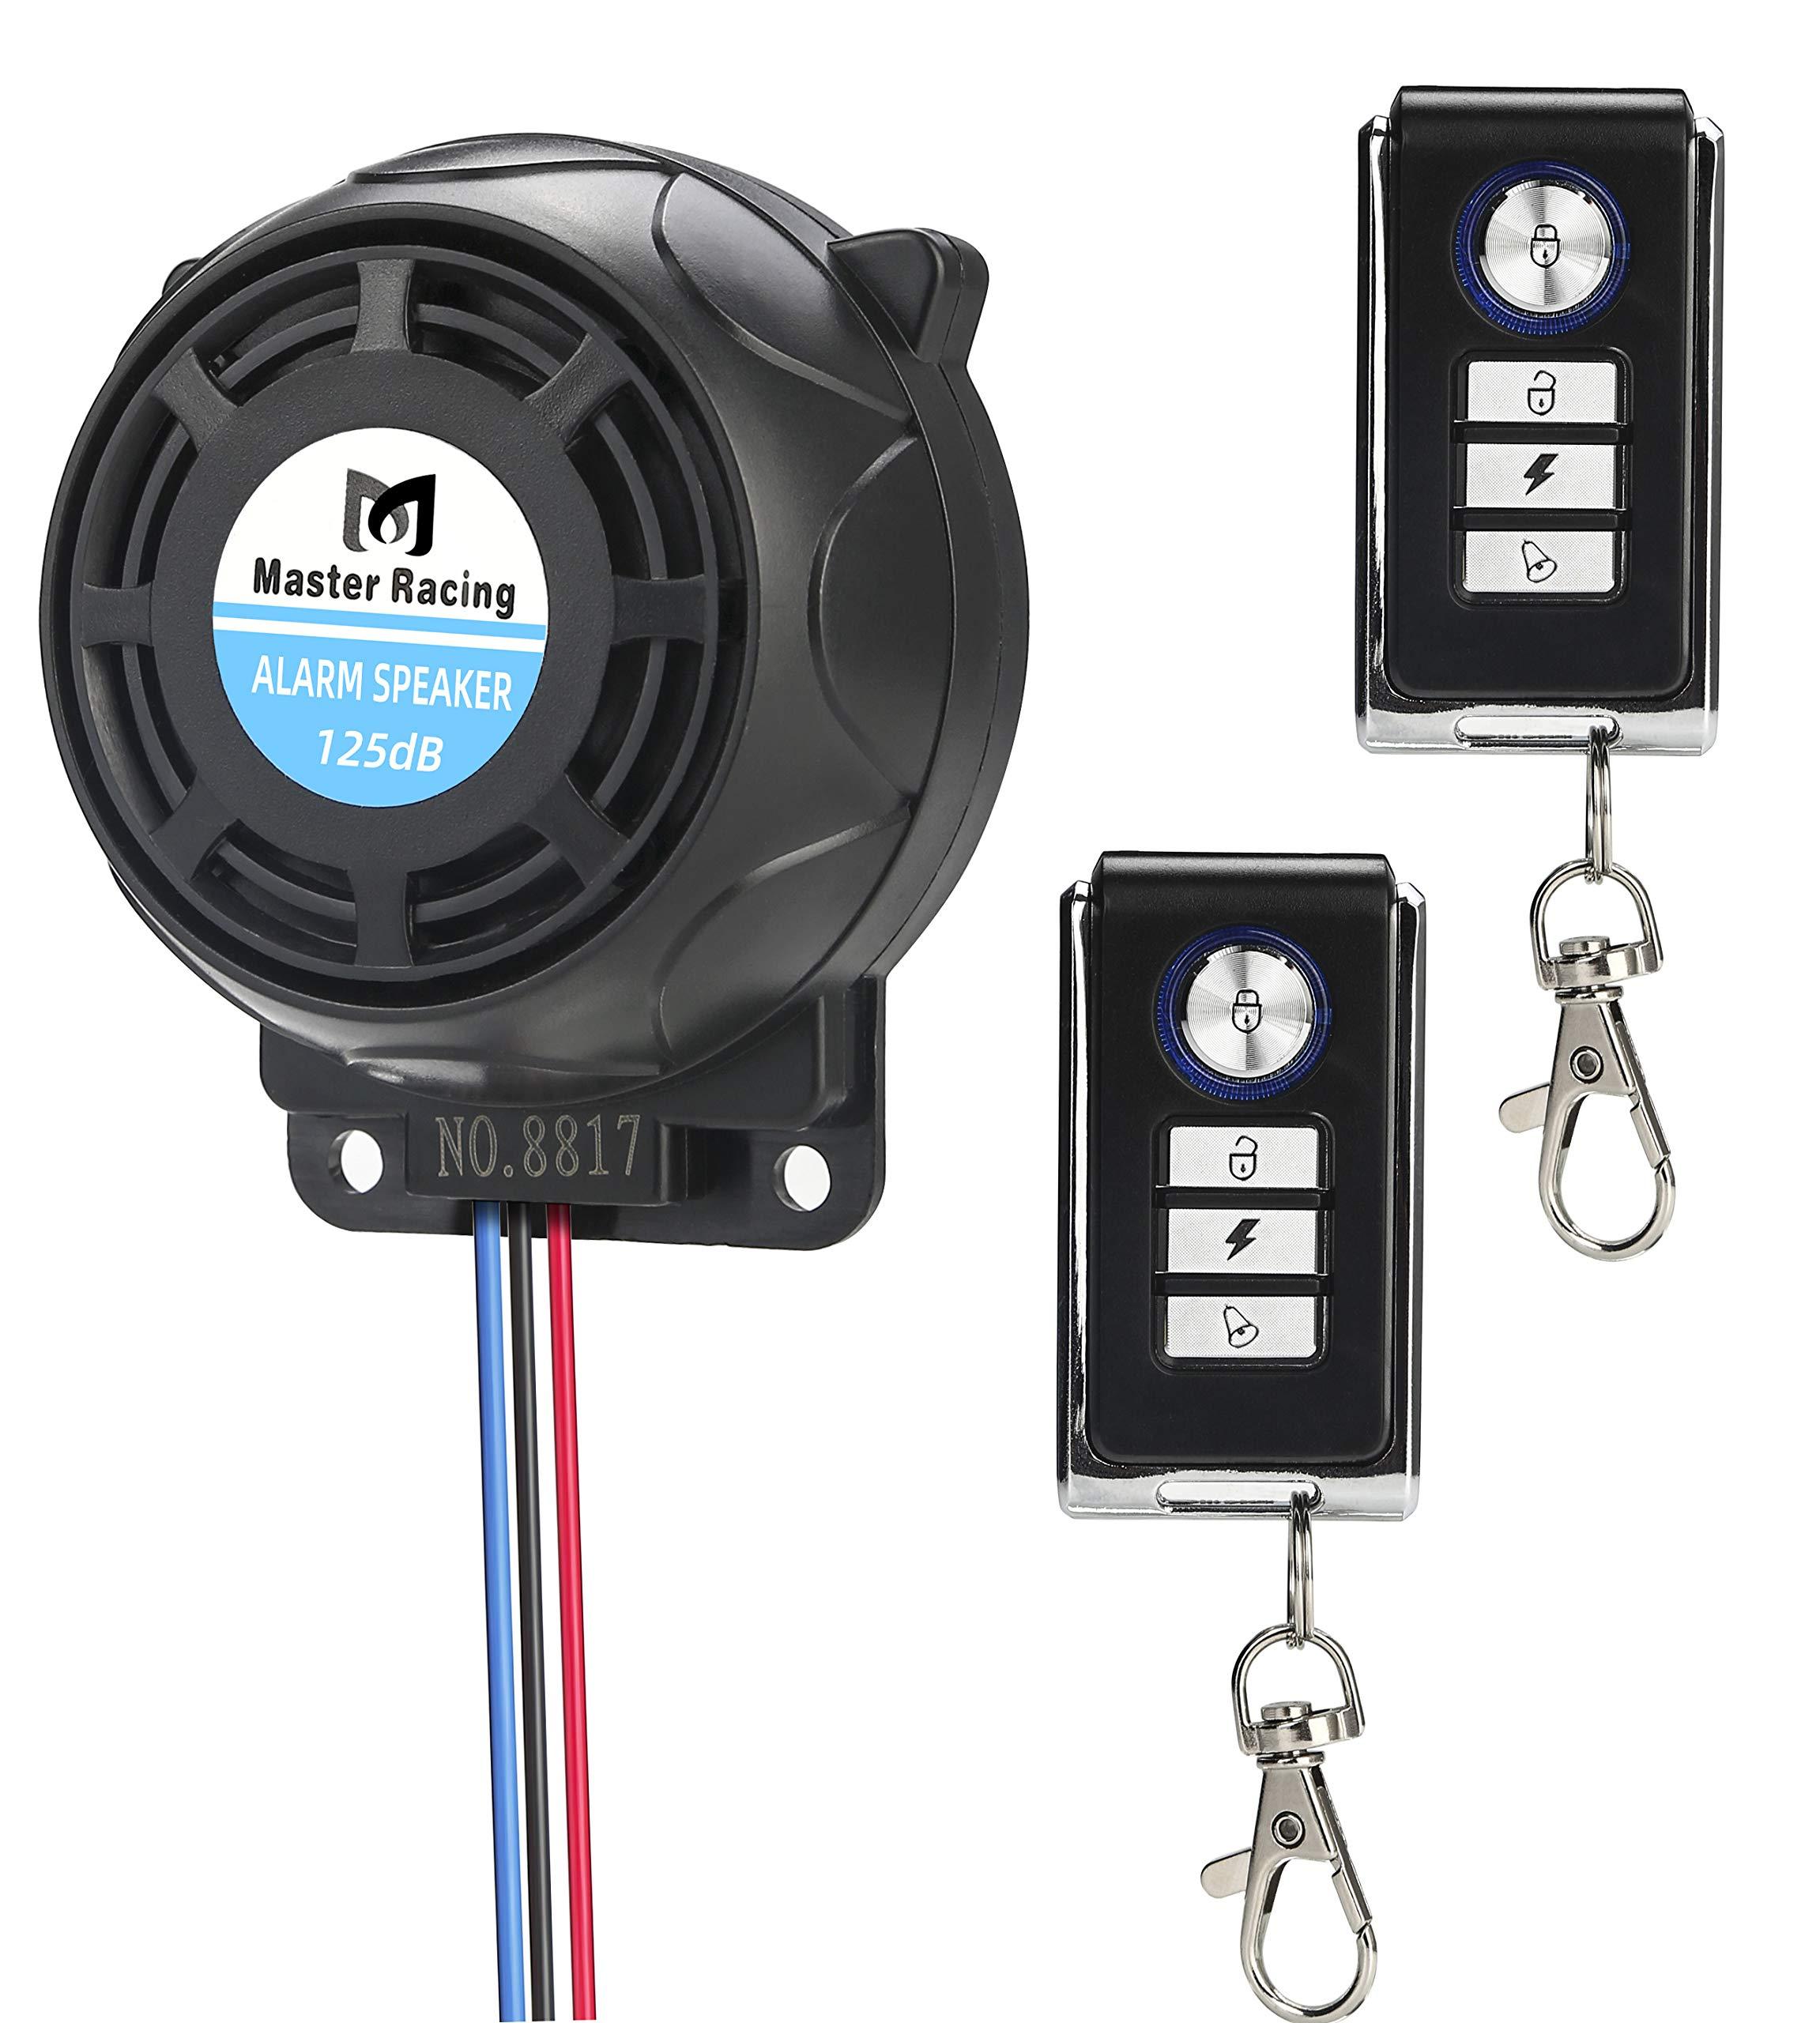 Rupse Wireless Alarm System Motorcycle Bicycle Bike Anti Theft Security Burglar Double Remote Control Warner Horn Adjustable Sensitivity